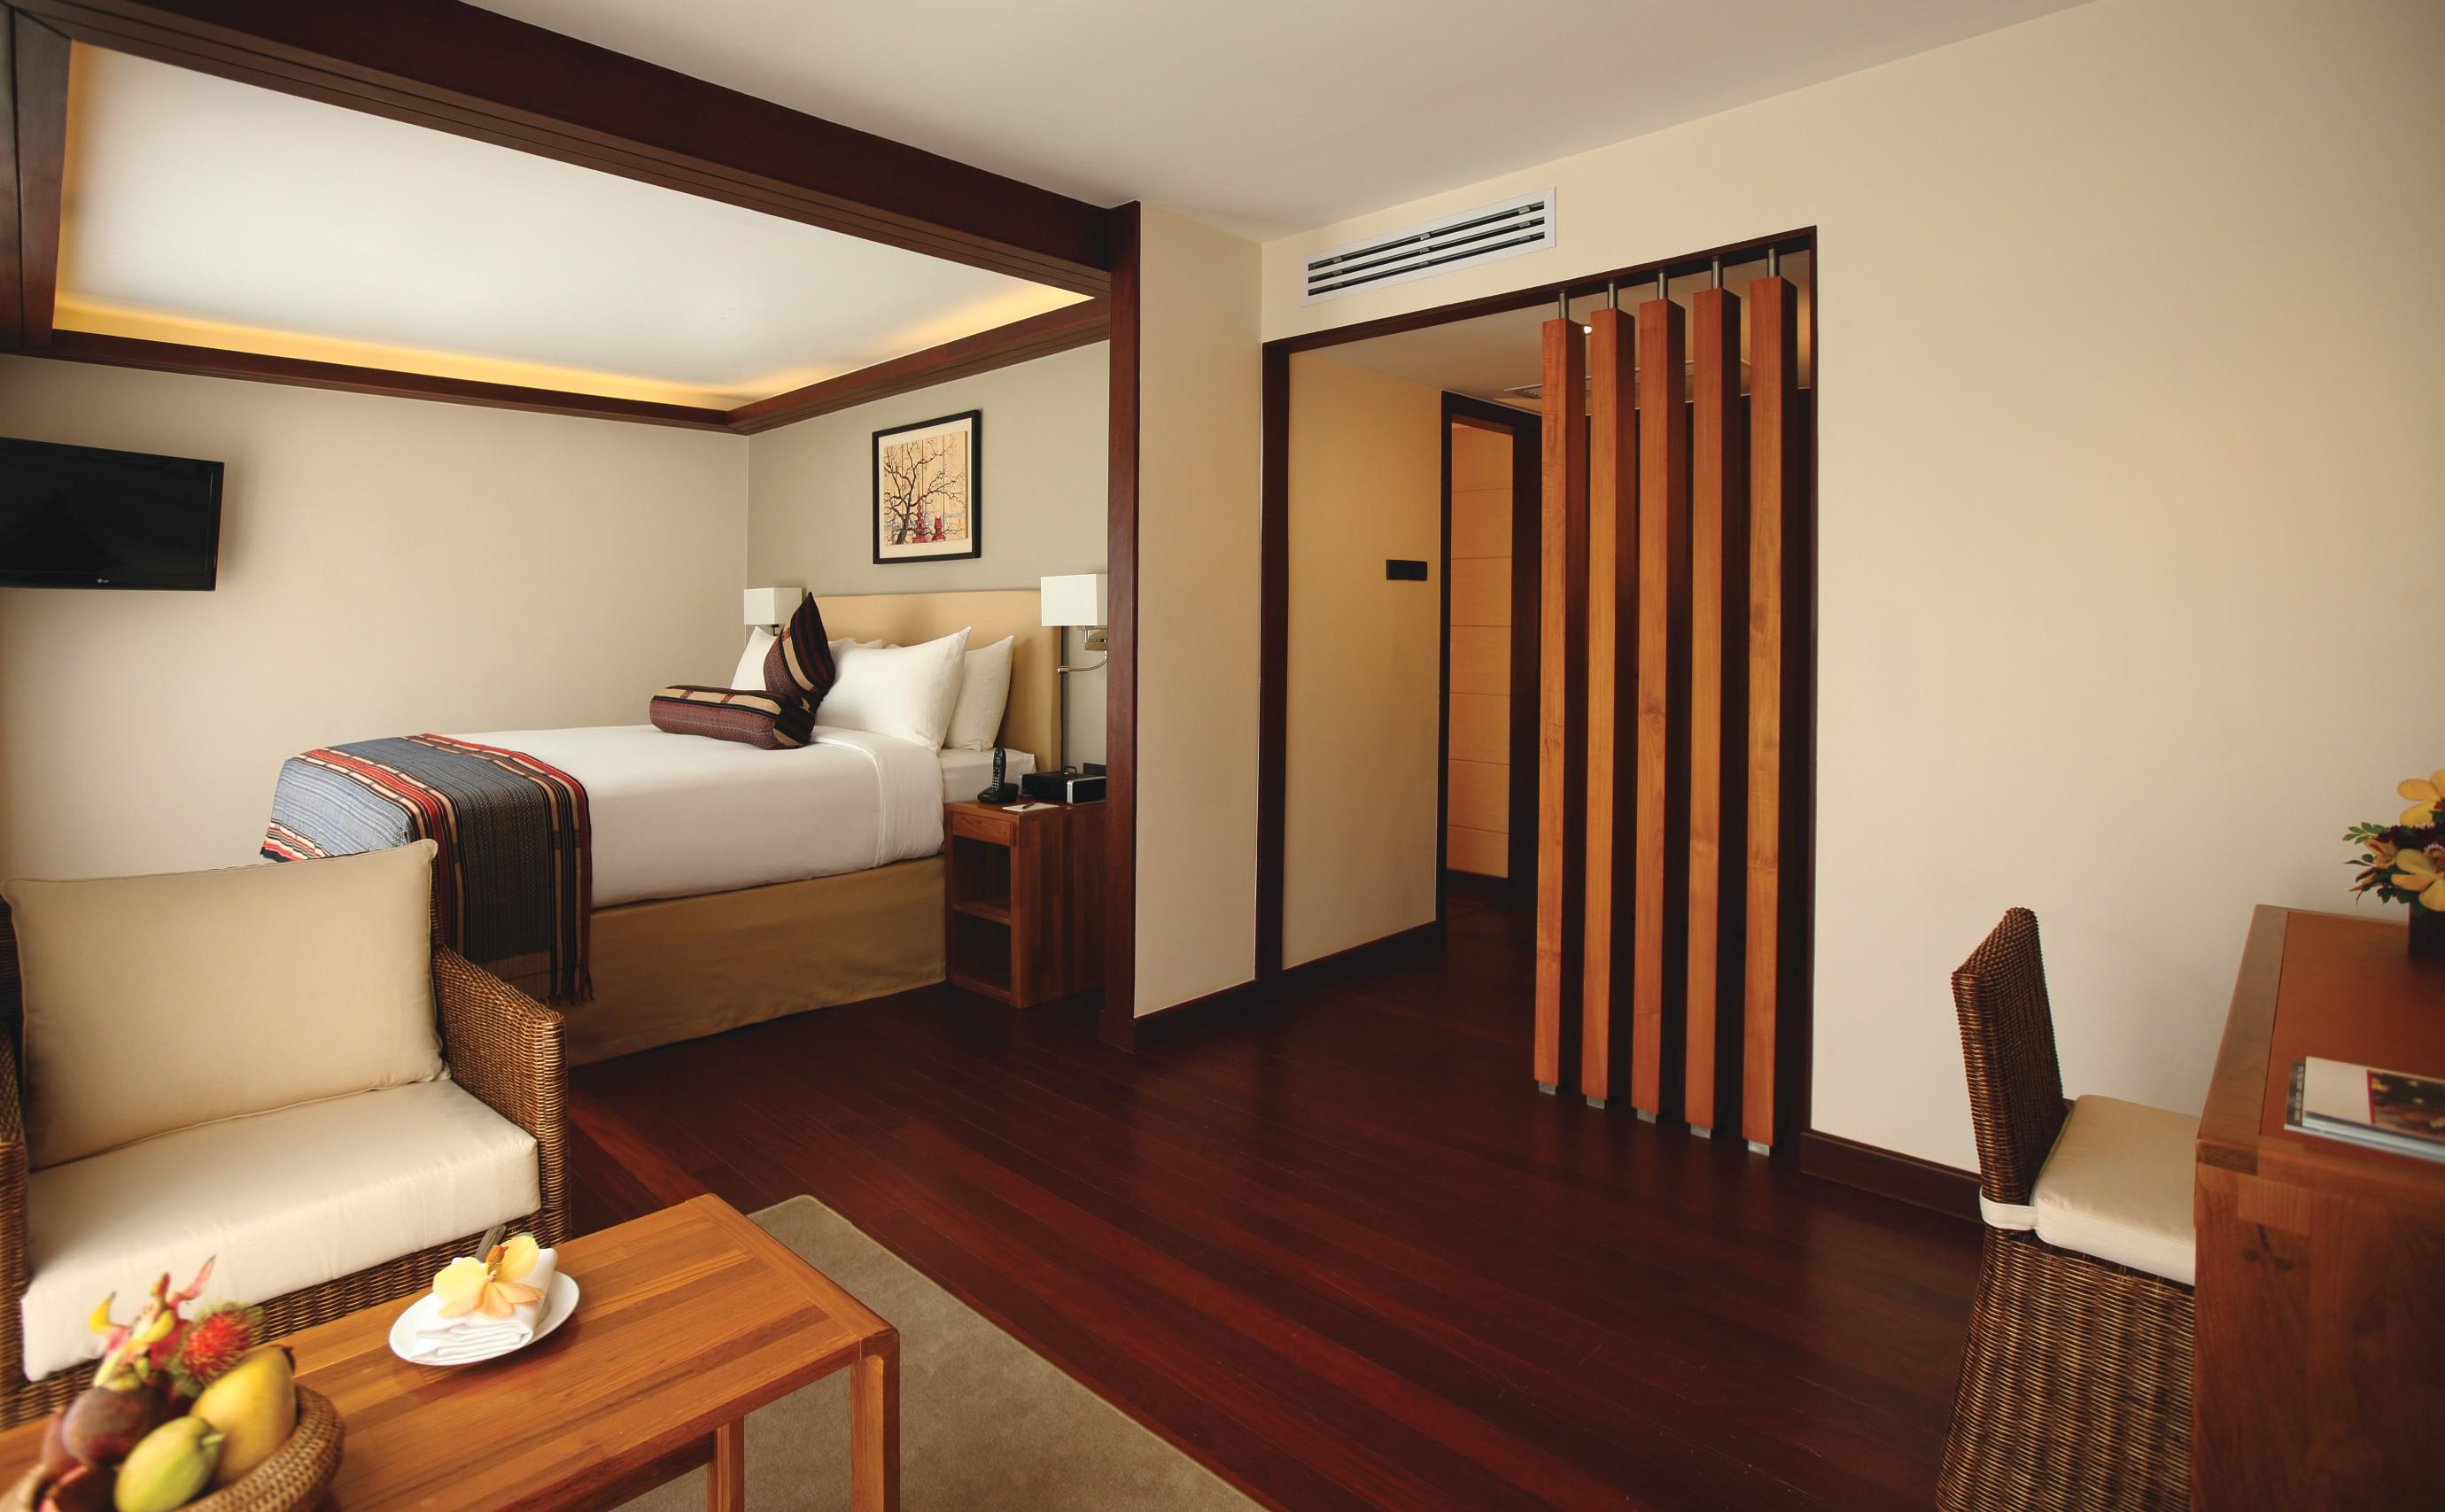 Belmond River Cruises Belmond Orcaella Accommodation Cabin 3.jpg